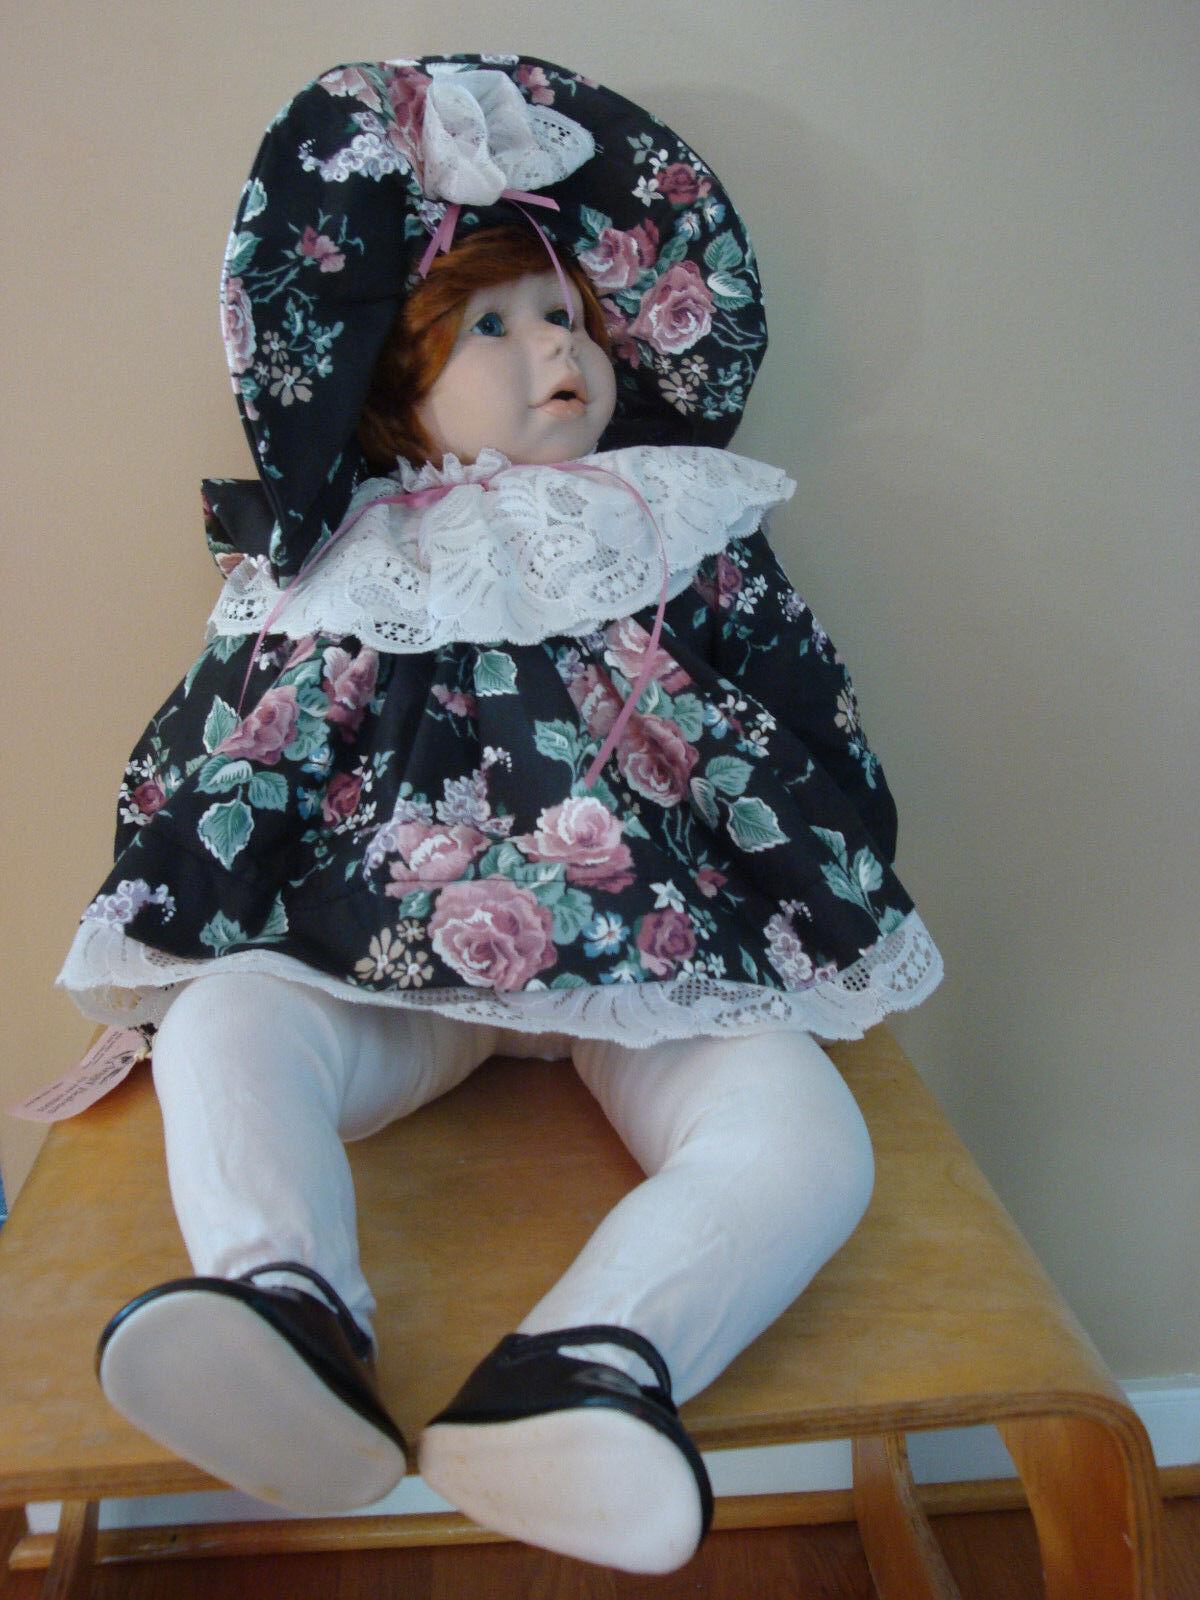 Pat Weeks  Sara Jane  Porcelain Doll 1993 Limited Edition No.2 25